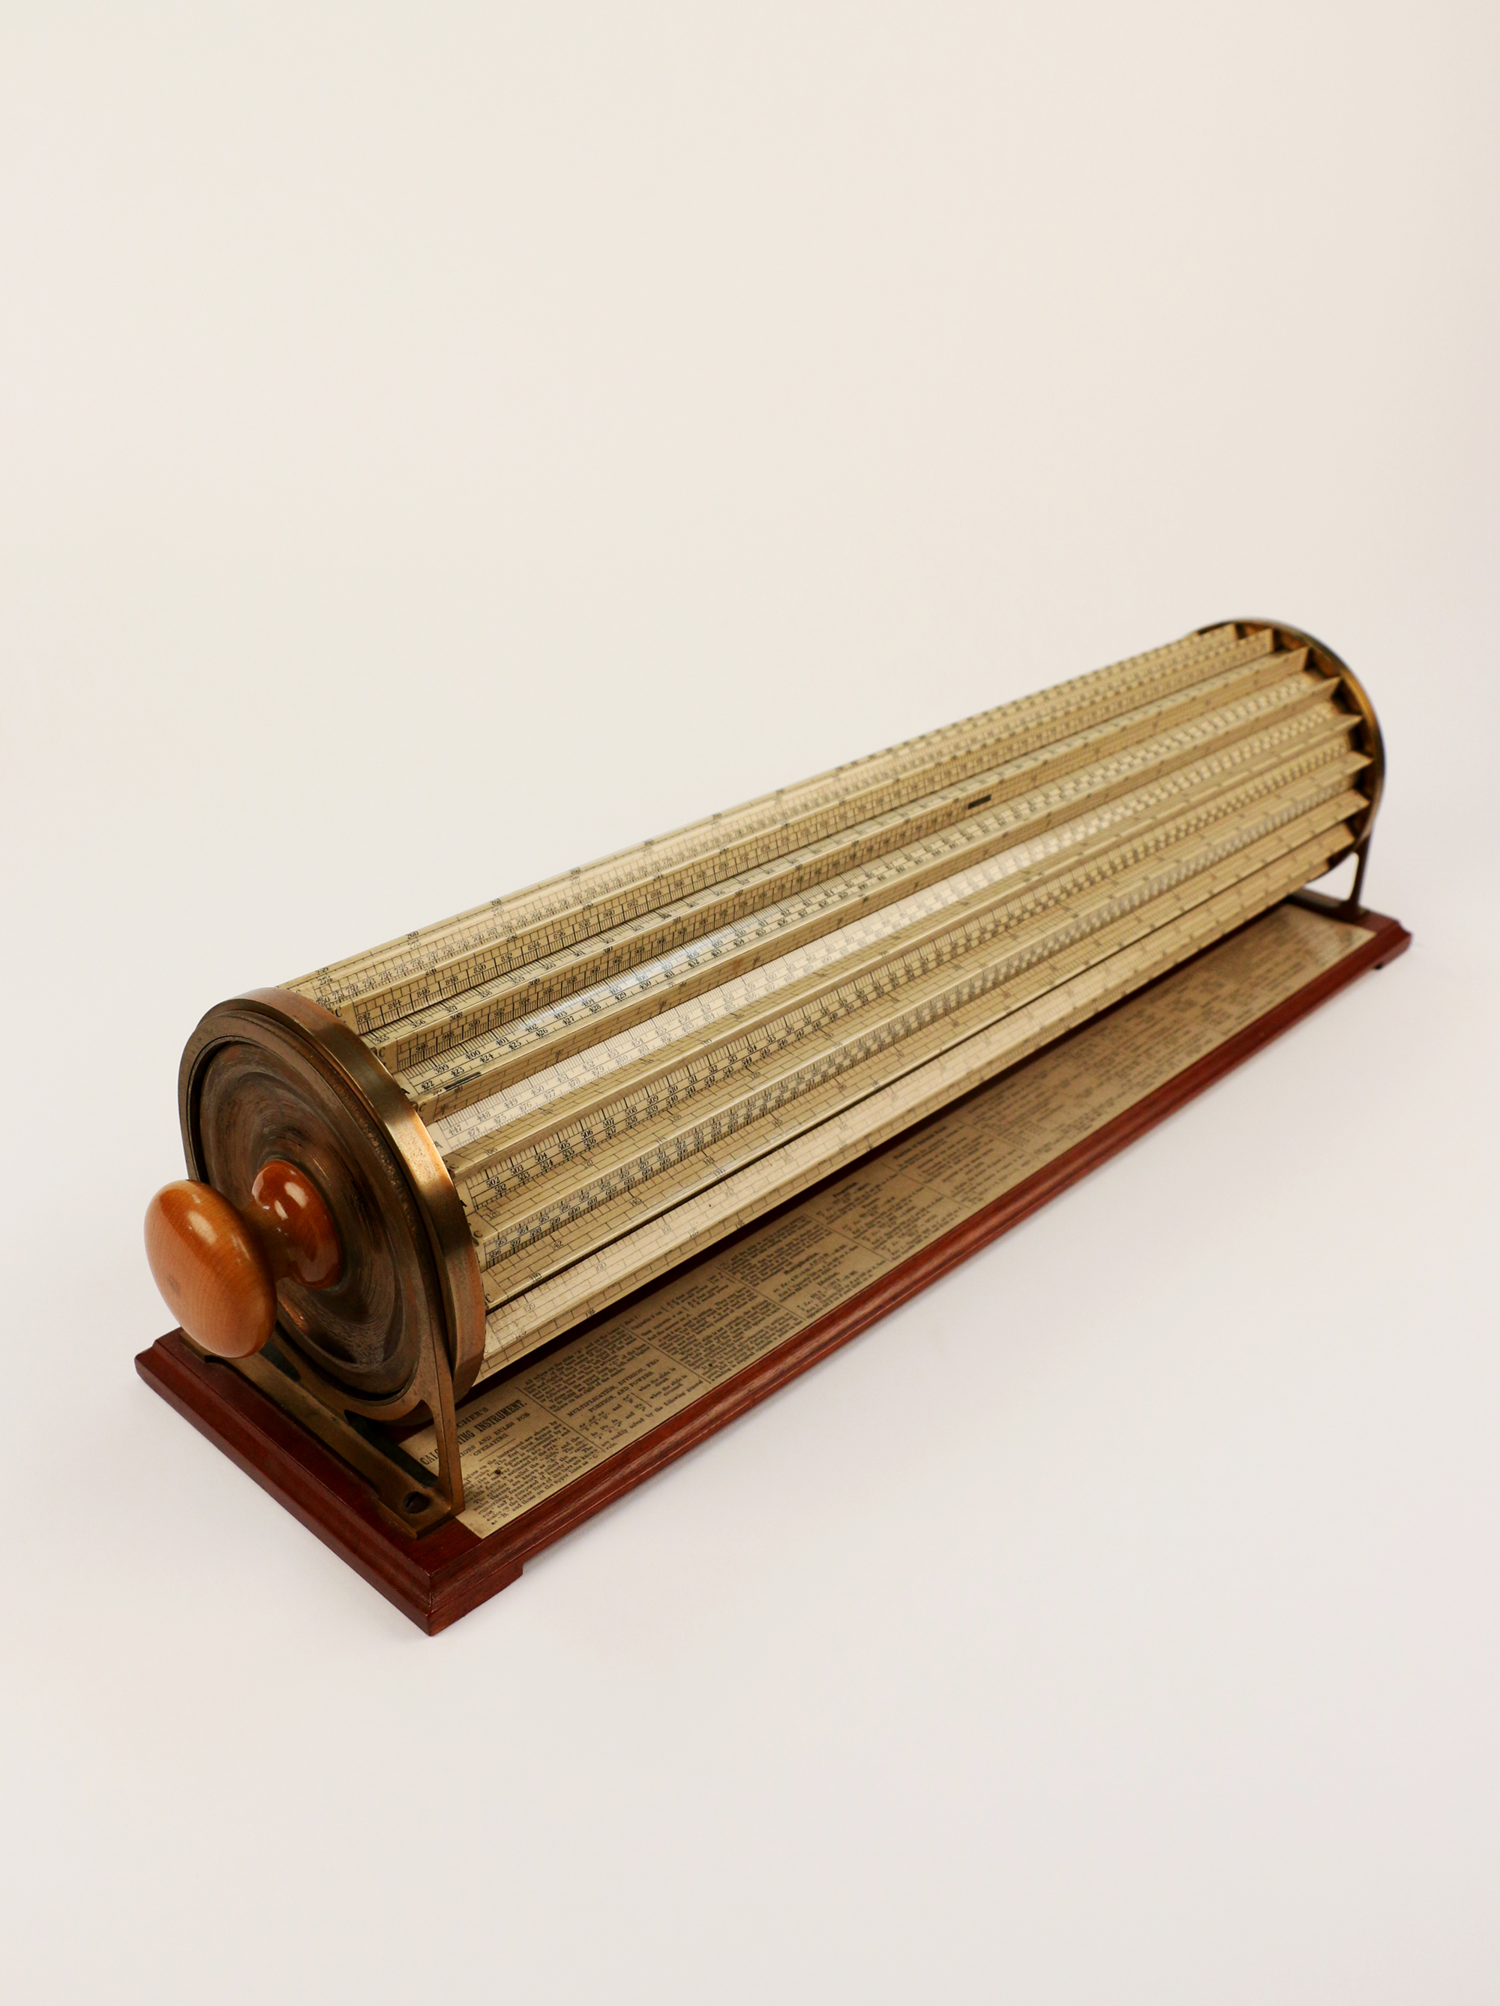 Thacher's Calculating Instrument — Techer